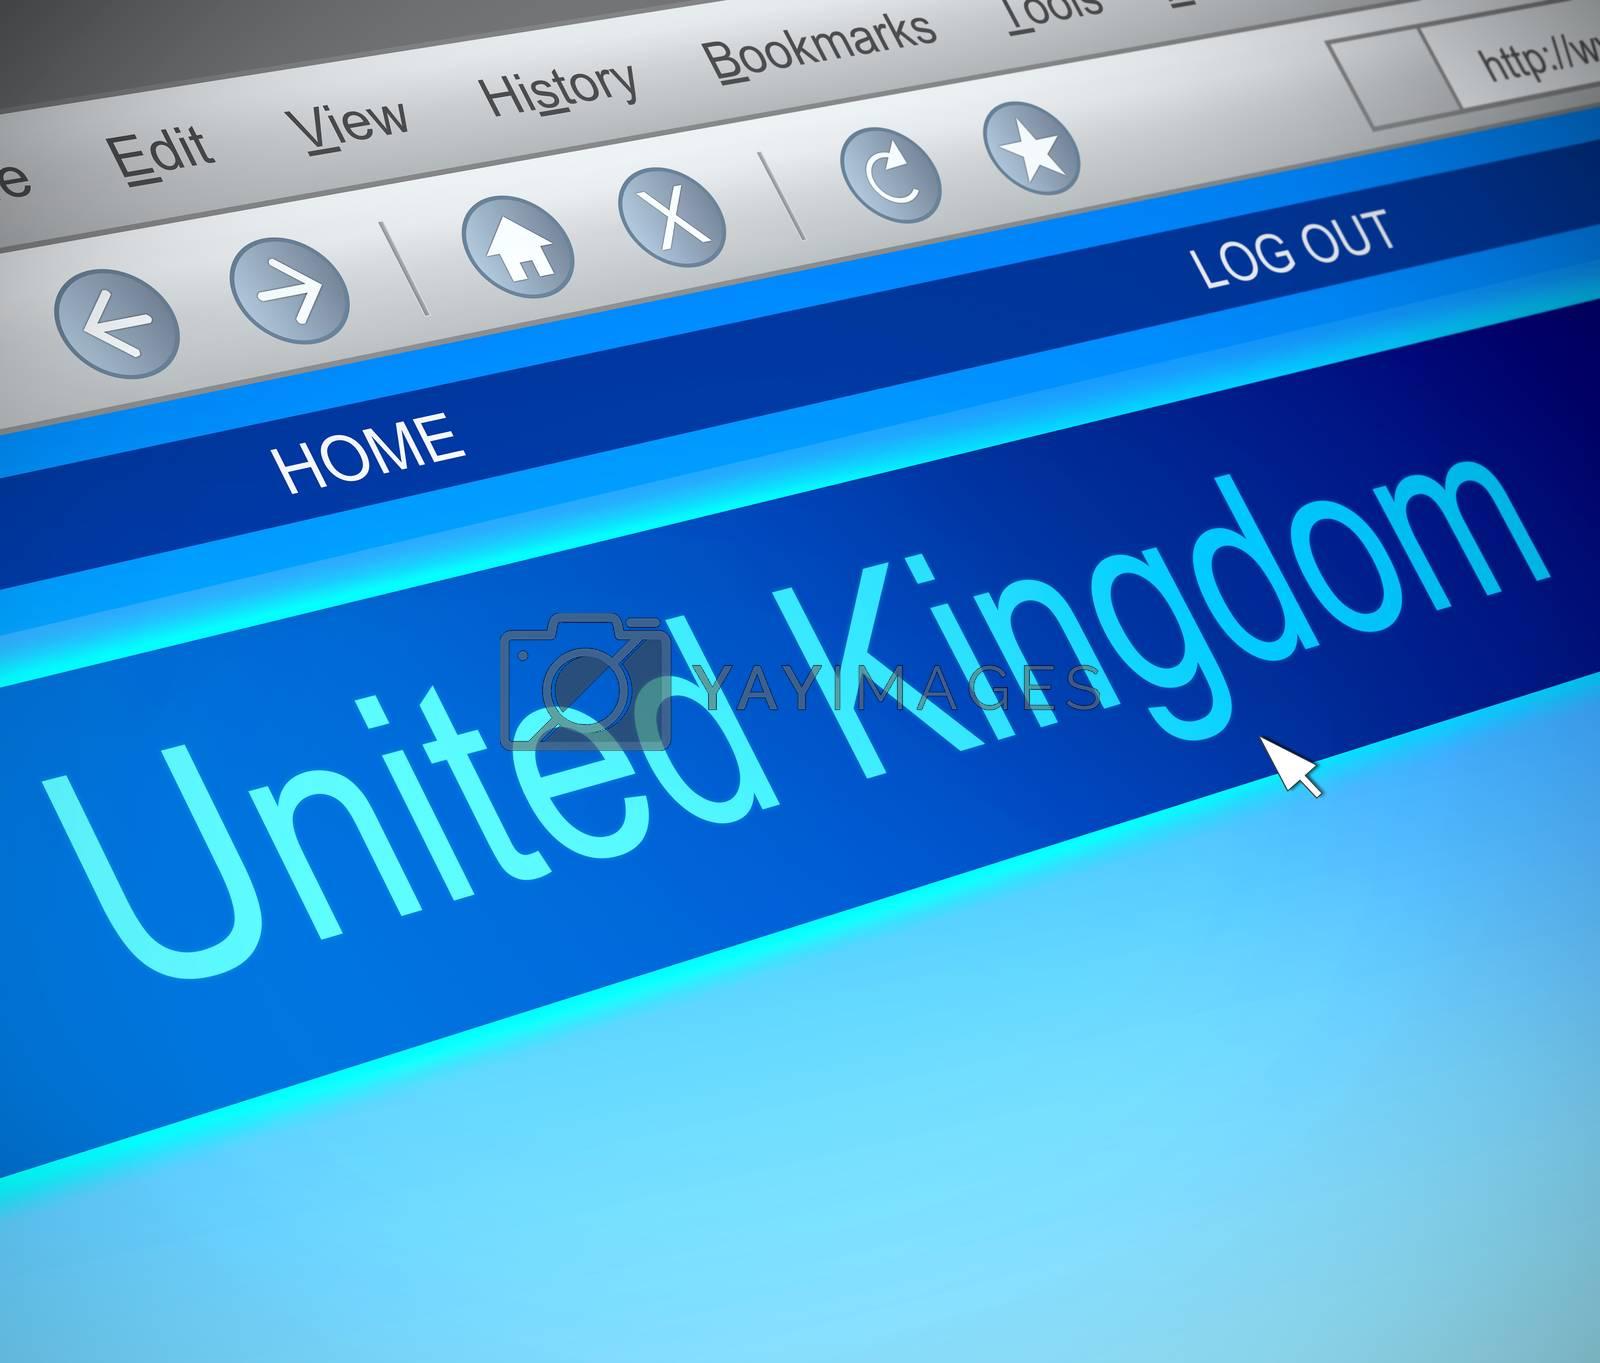 United Kingdom sign. by 72soul